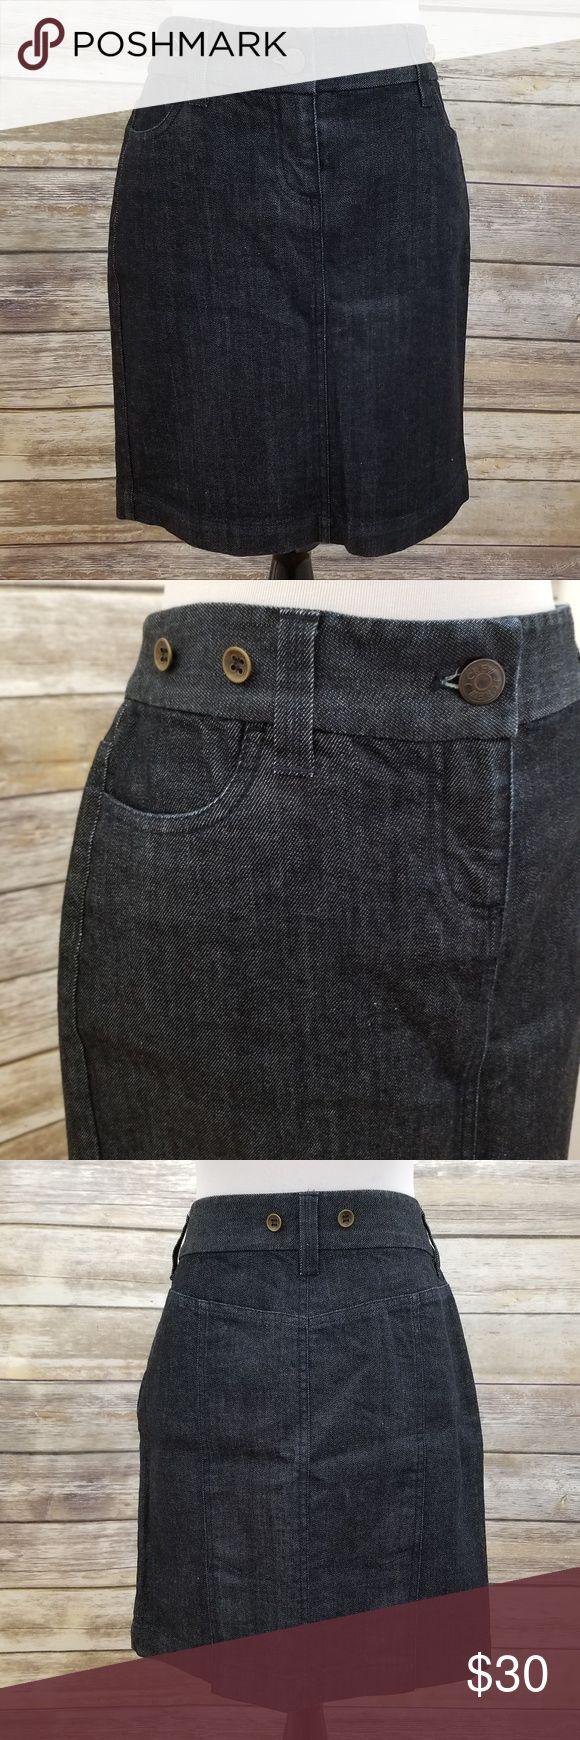 "J. Crew denim jean pencil skirt EUC, size 6P denim/jean skirt by J. Crew.  Has buttons on waist for suspenders!  Super adorable!    Measurements: (approximate flat lay) Length: 18 1/2"" J. Crew Skirts Pencil"